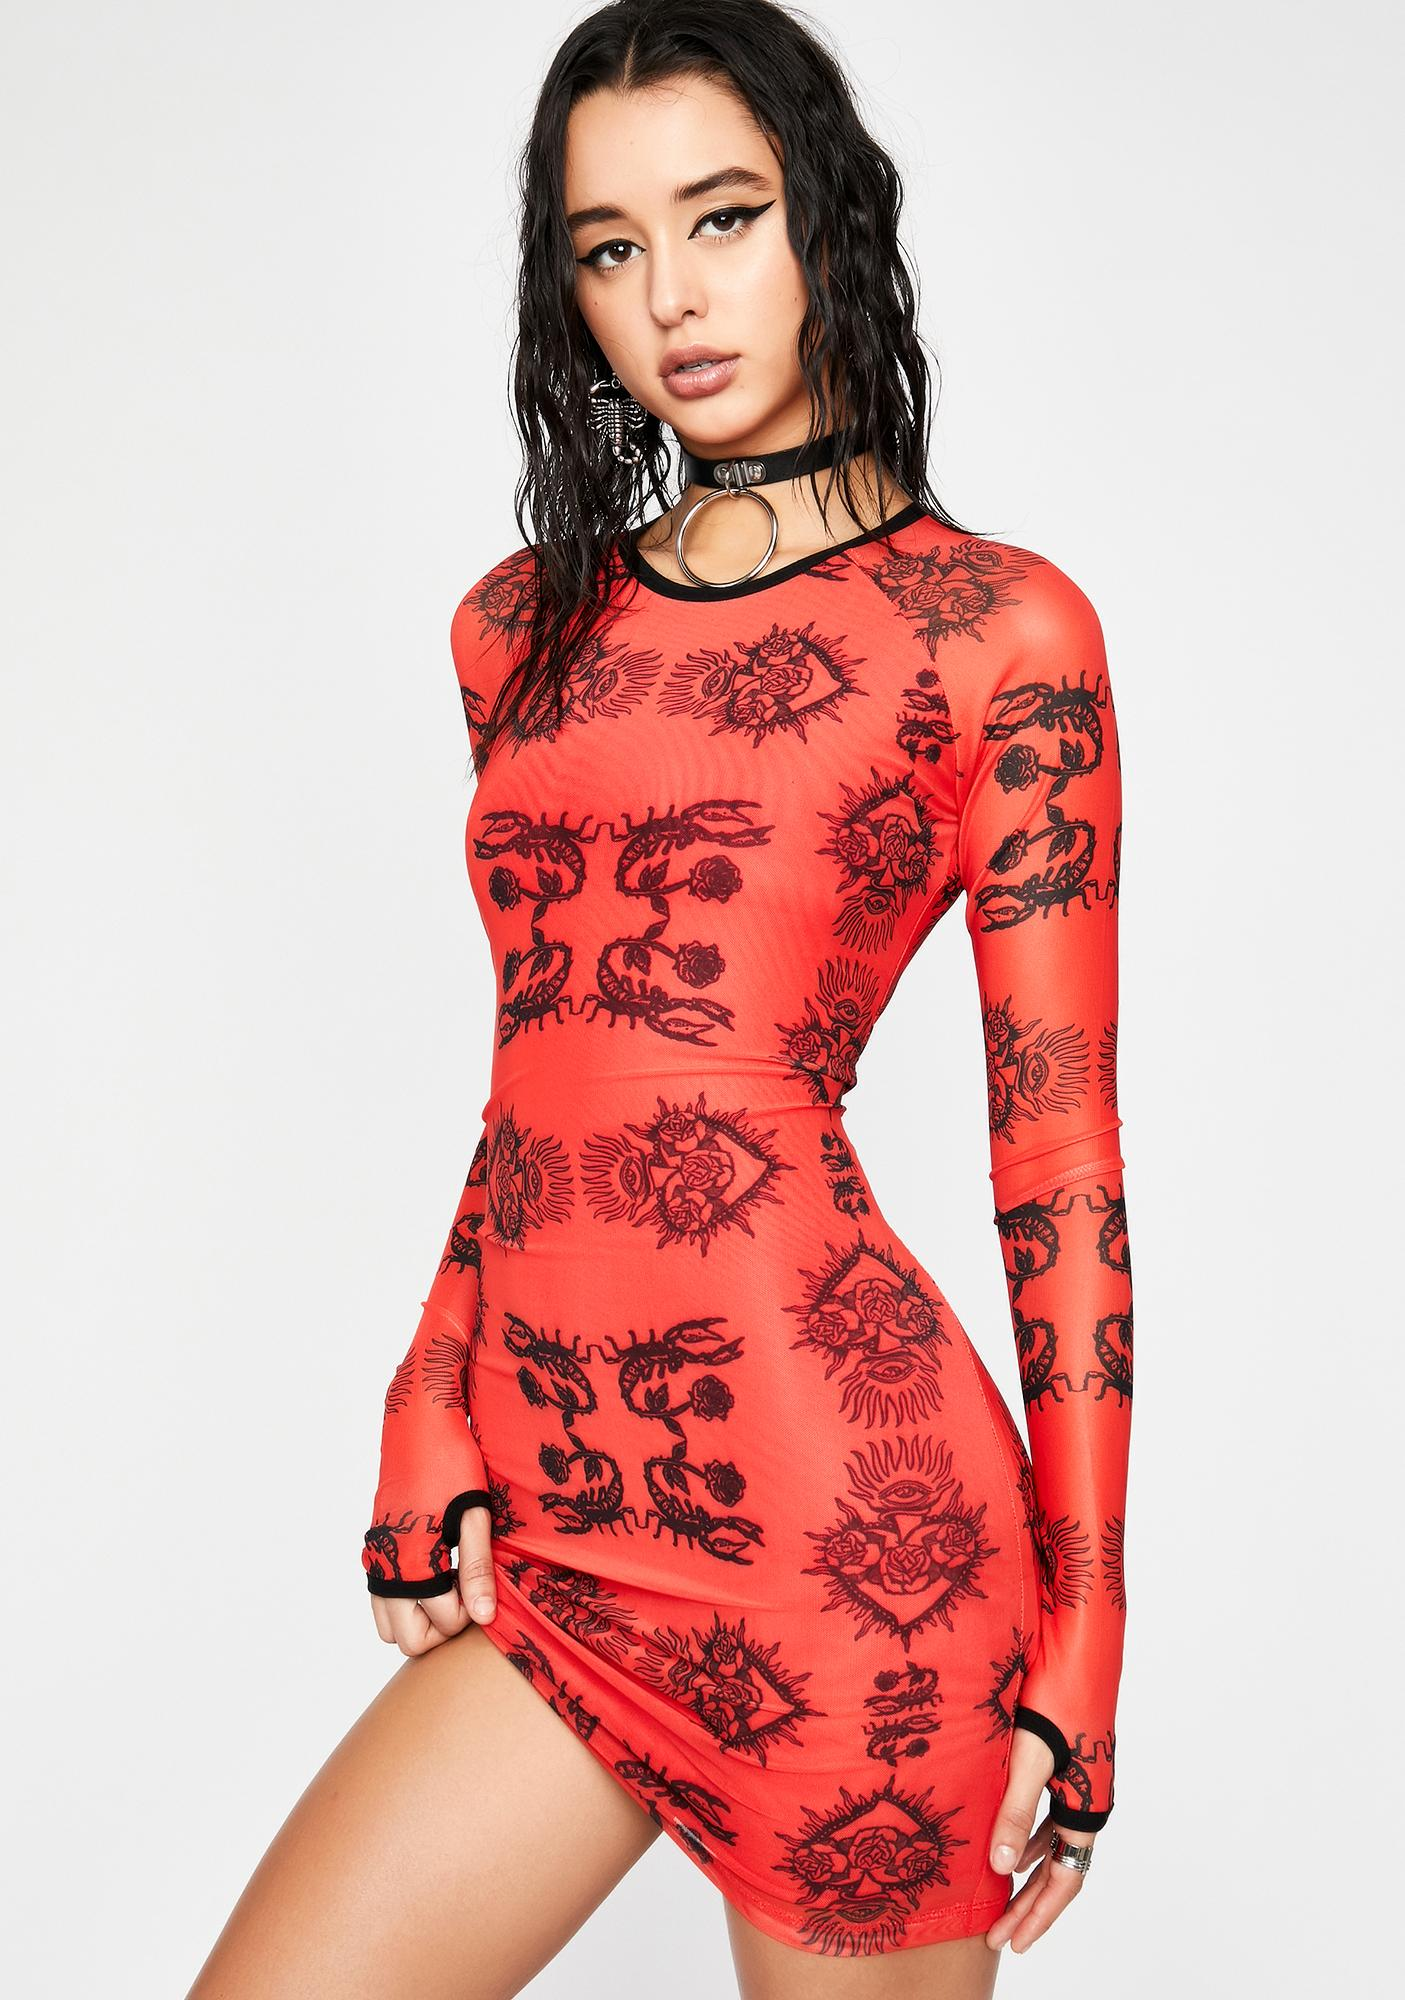 HOROSCOPEZ Dressed To Kill Mesh Dress